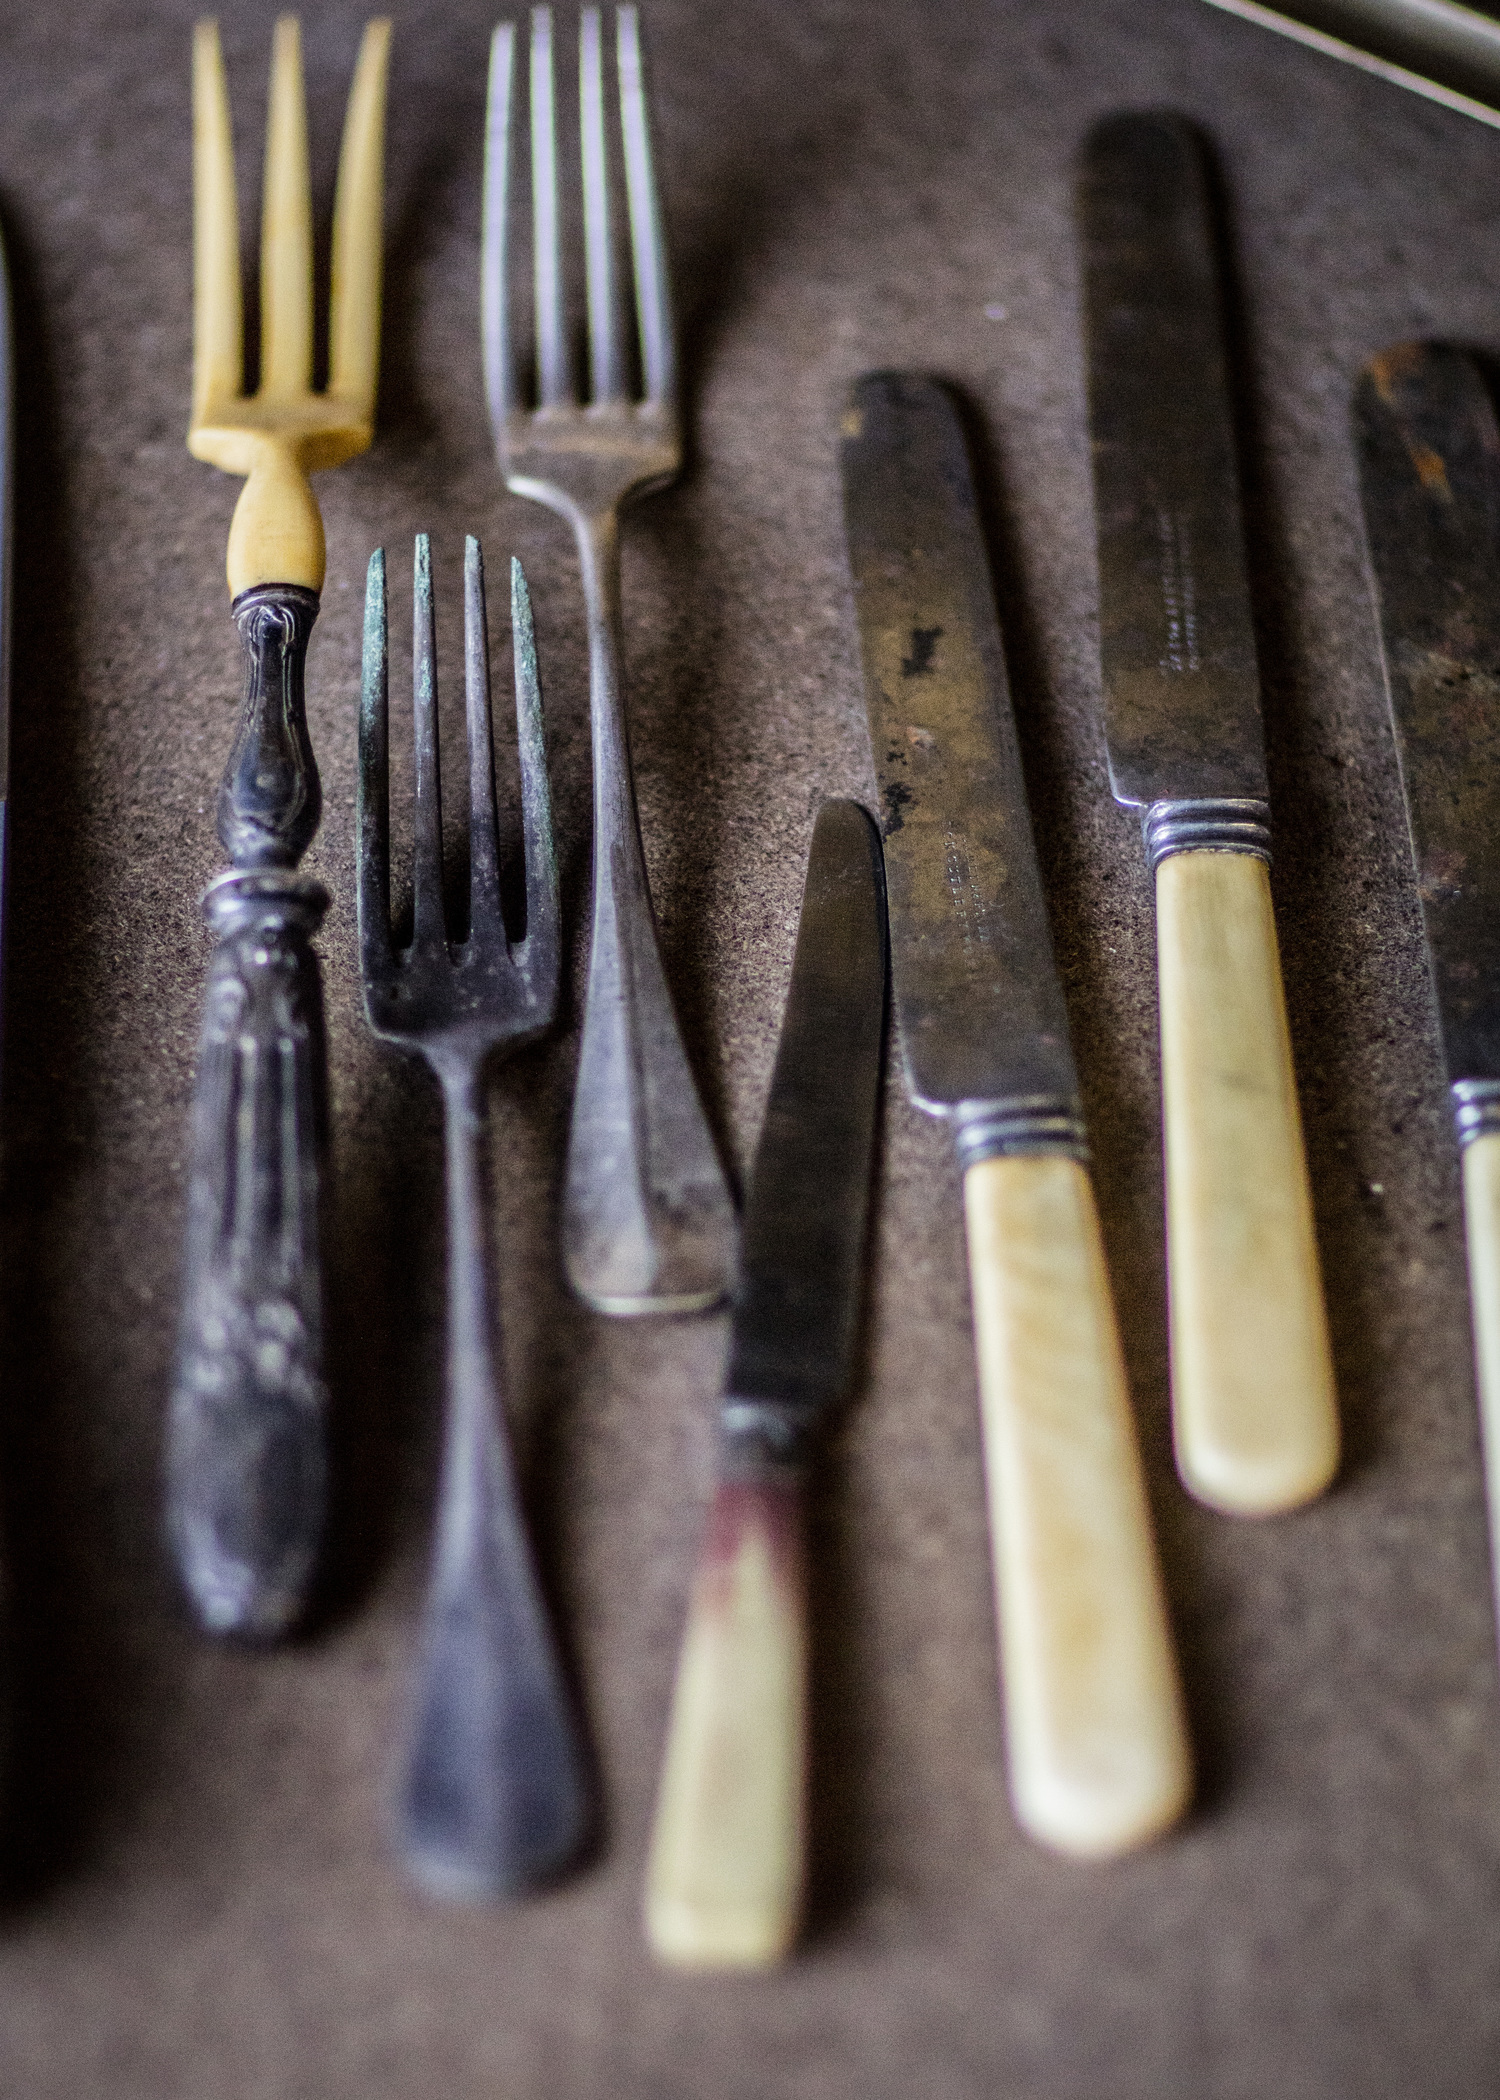 Knives and forks.jpg